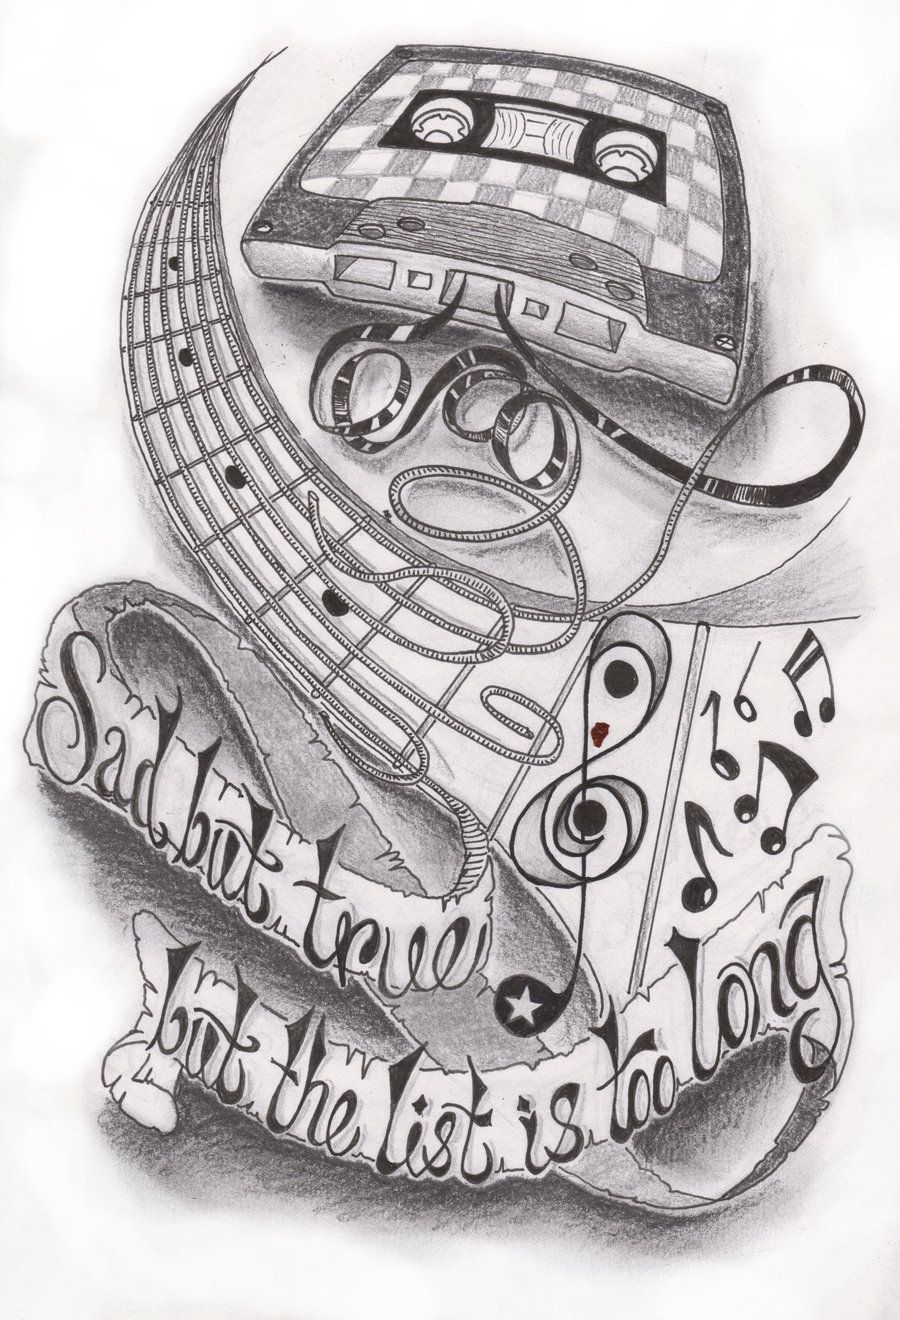 Music tattoo designs tattoo ideas pictures tattoo ideas pictures - Tattoo Ideas For Men Half Sleeve Drawingsflower Tattoos Half Sleeve Tattoo Designs Forearm Half Sleeve